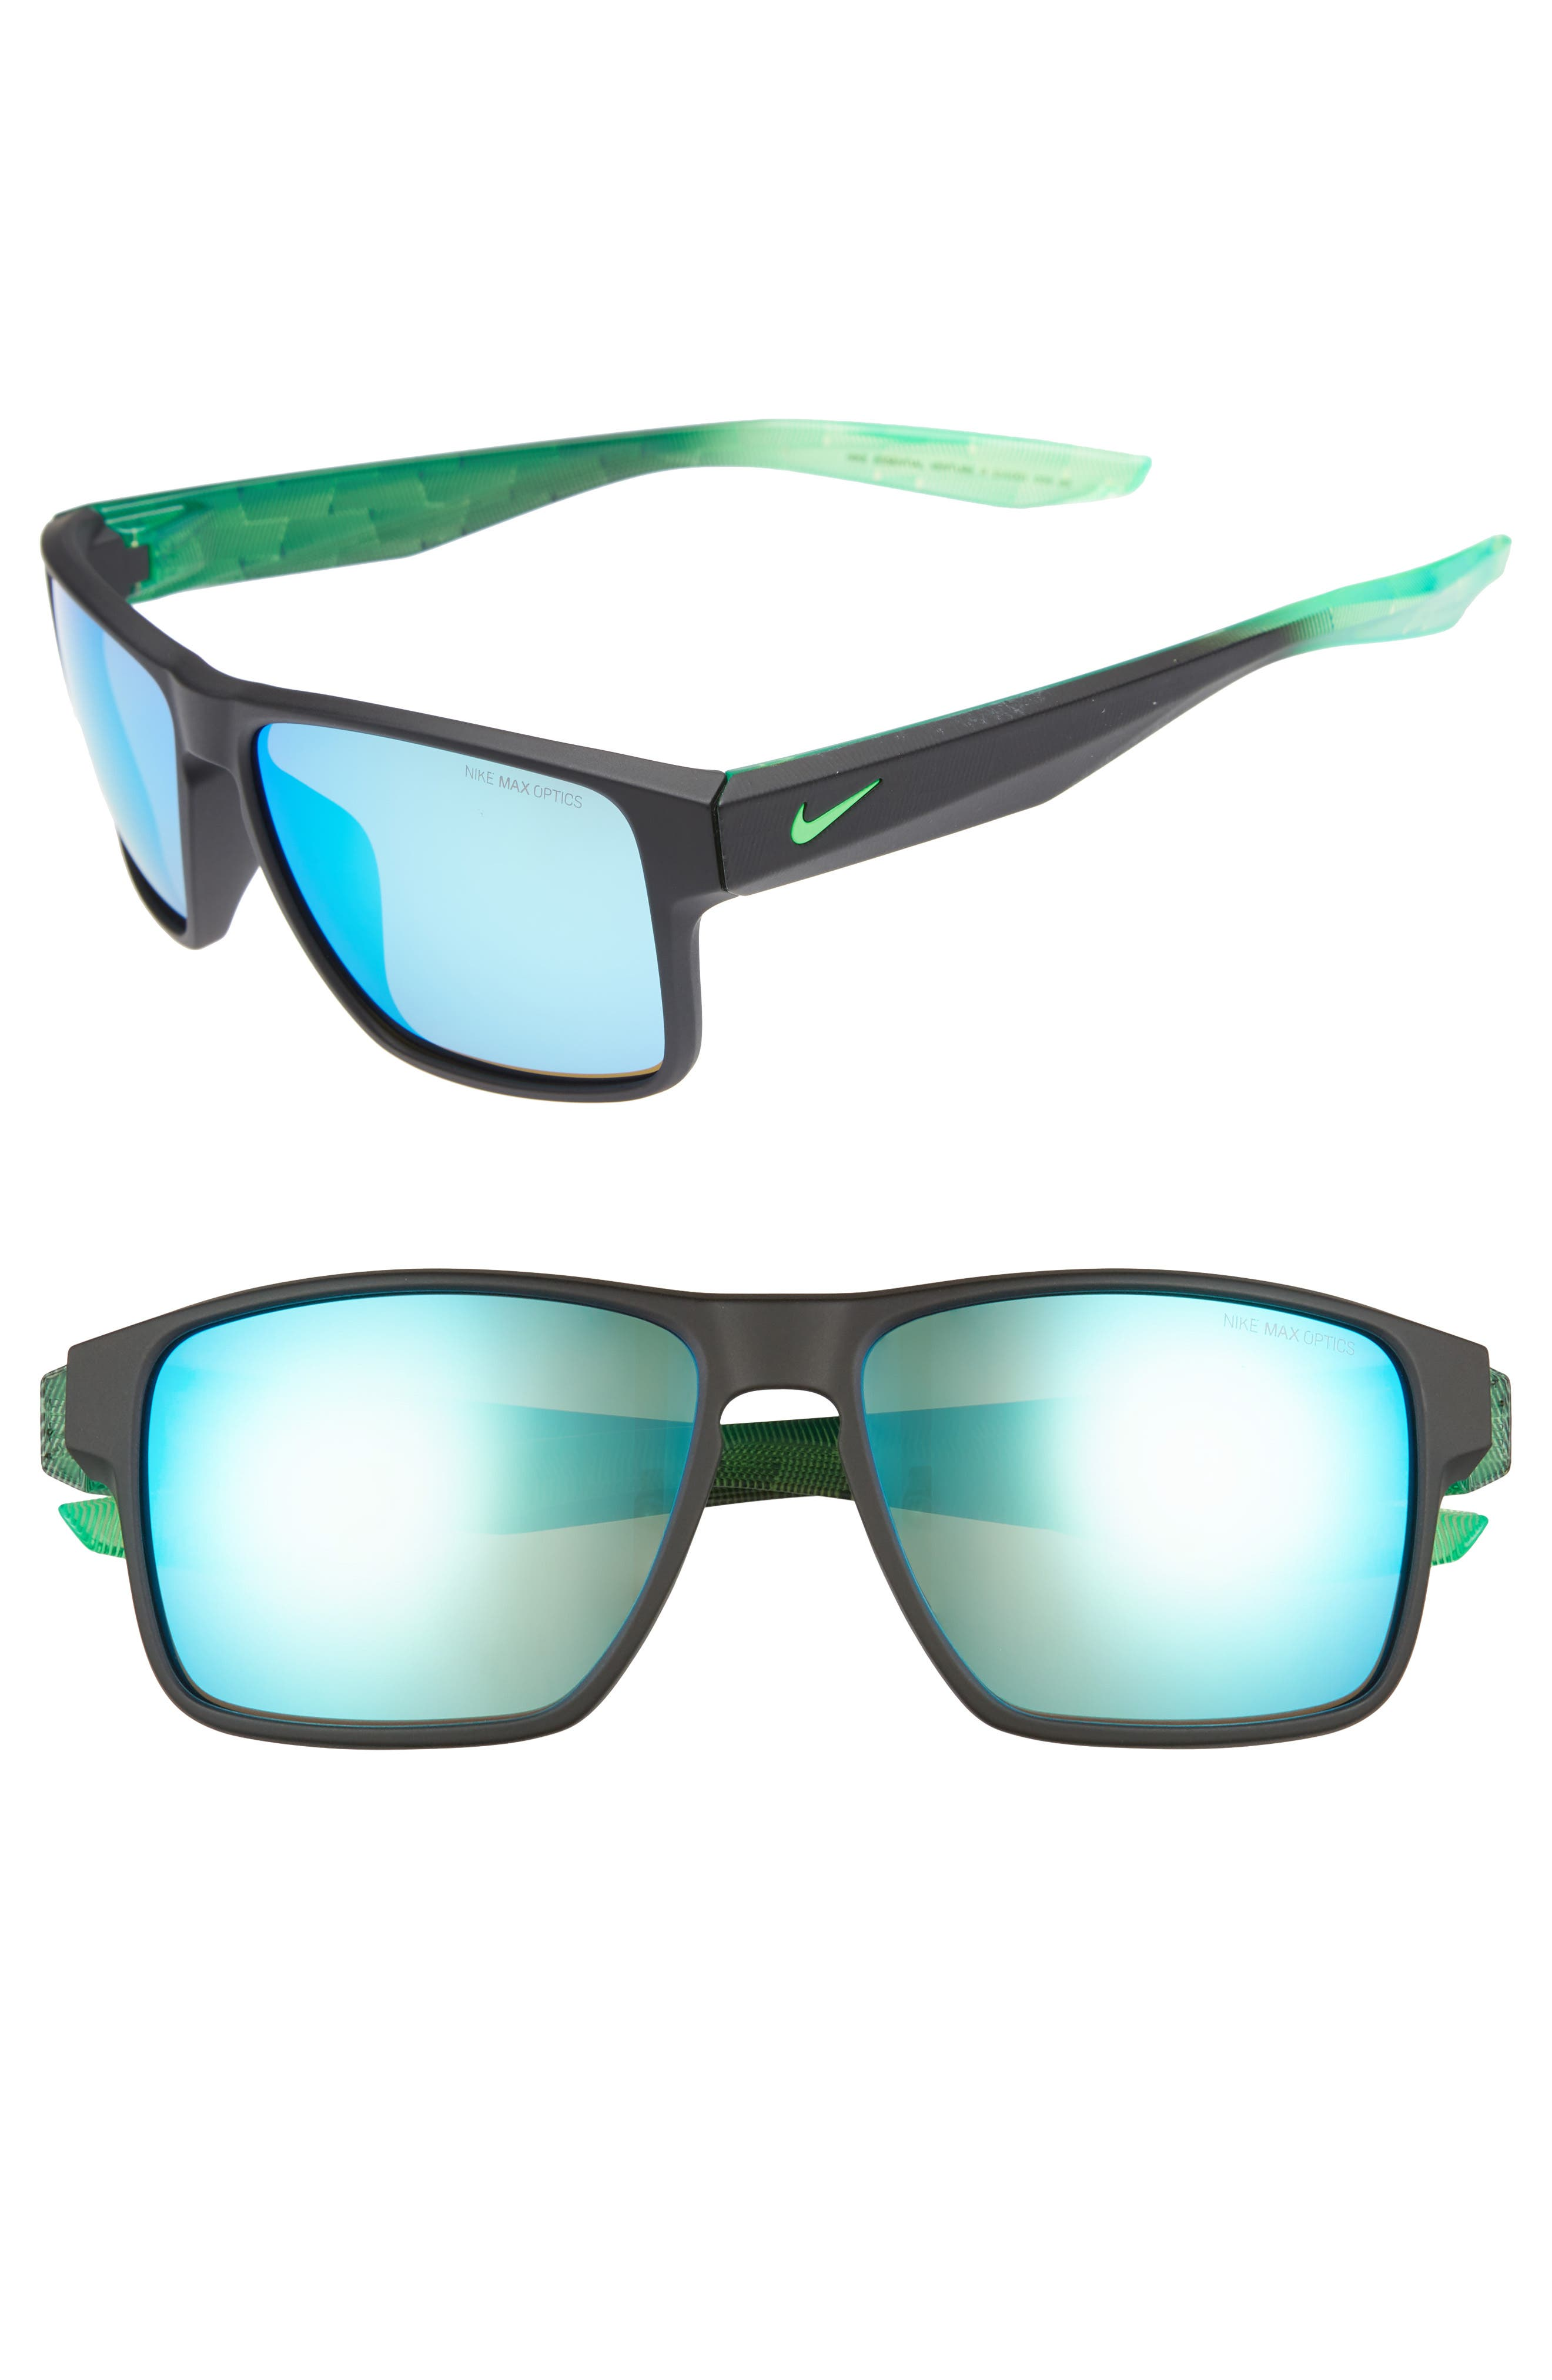 Essential Venture R 59mm Sunglasses,                         Main,                         color, MATTE BLACK/ GREEN